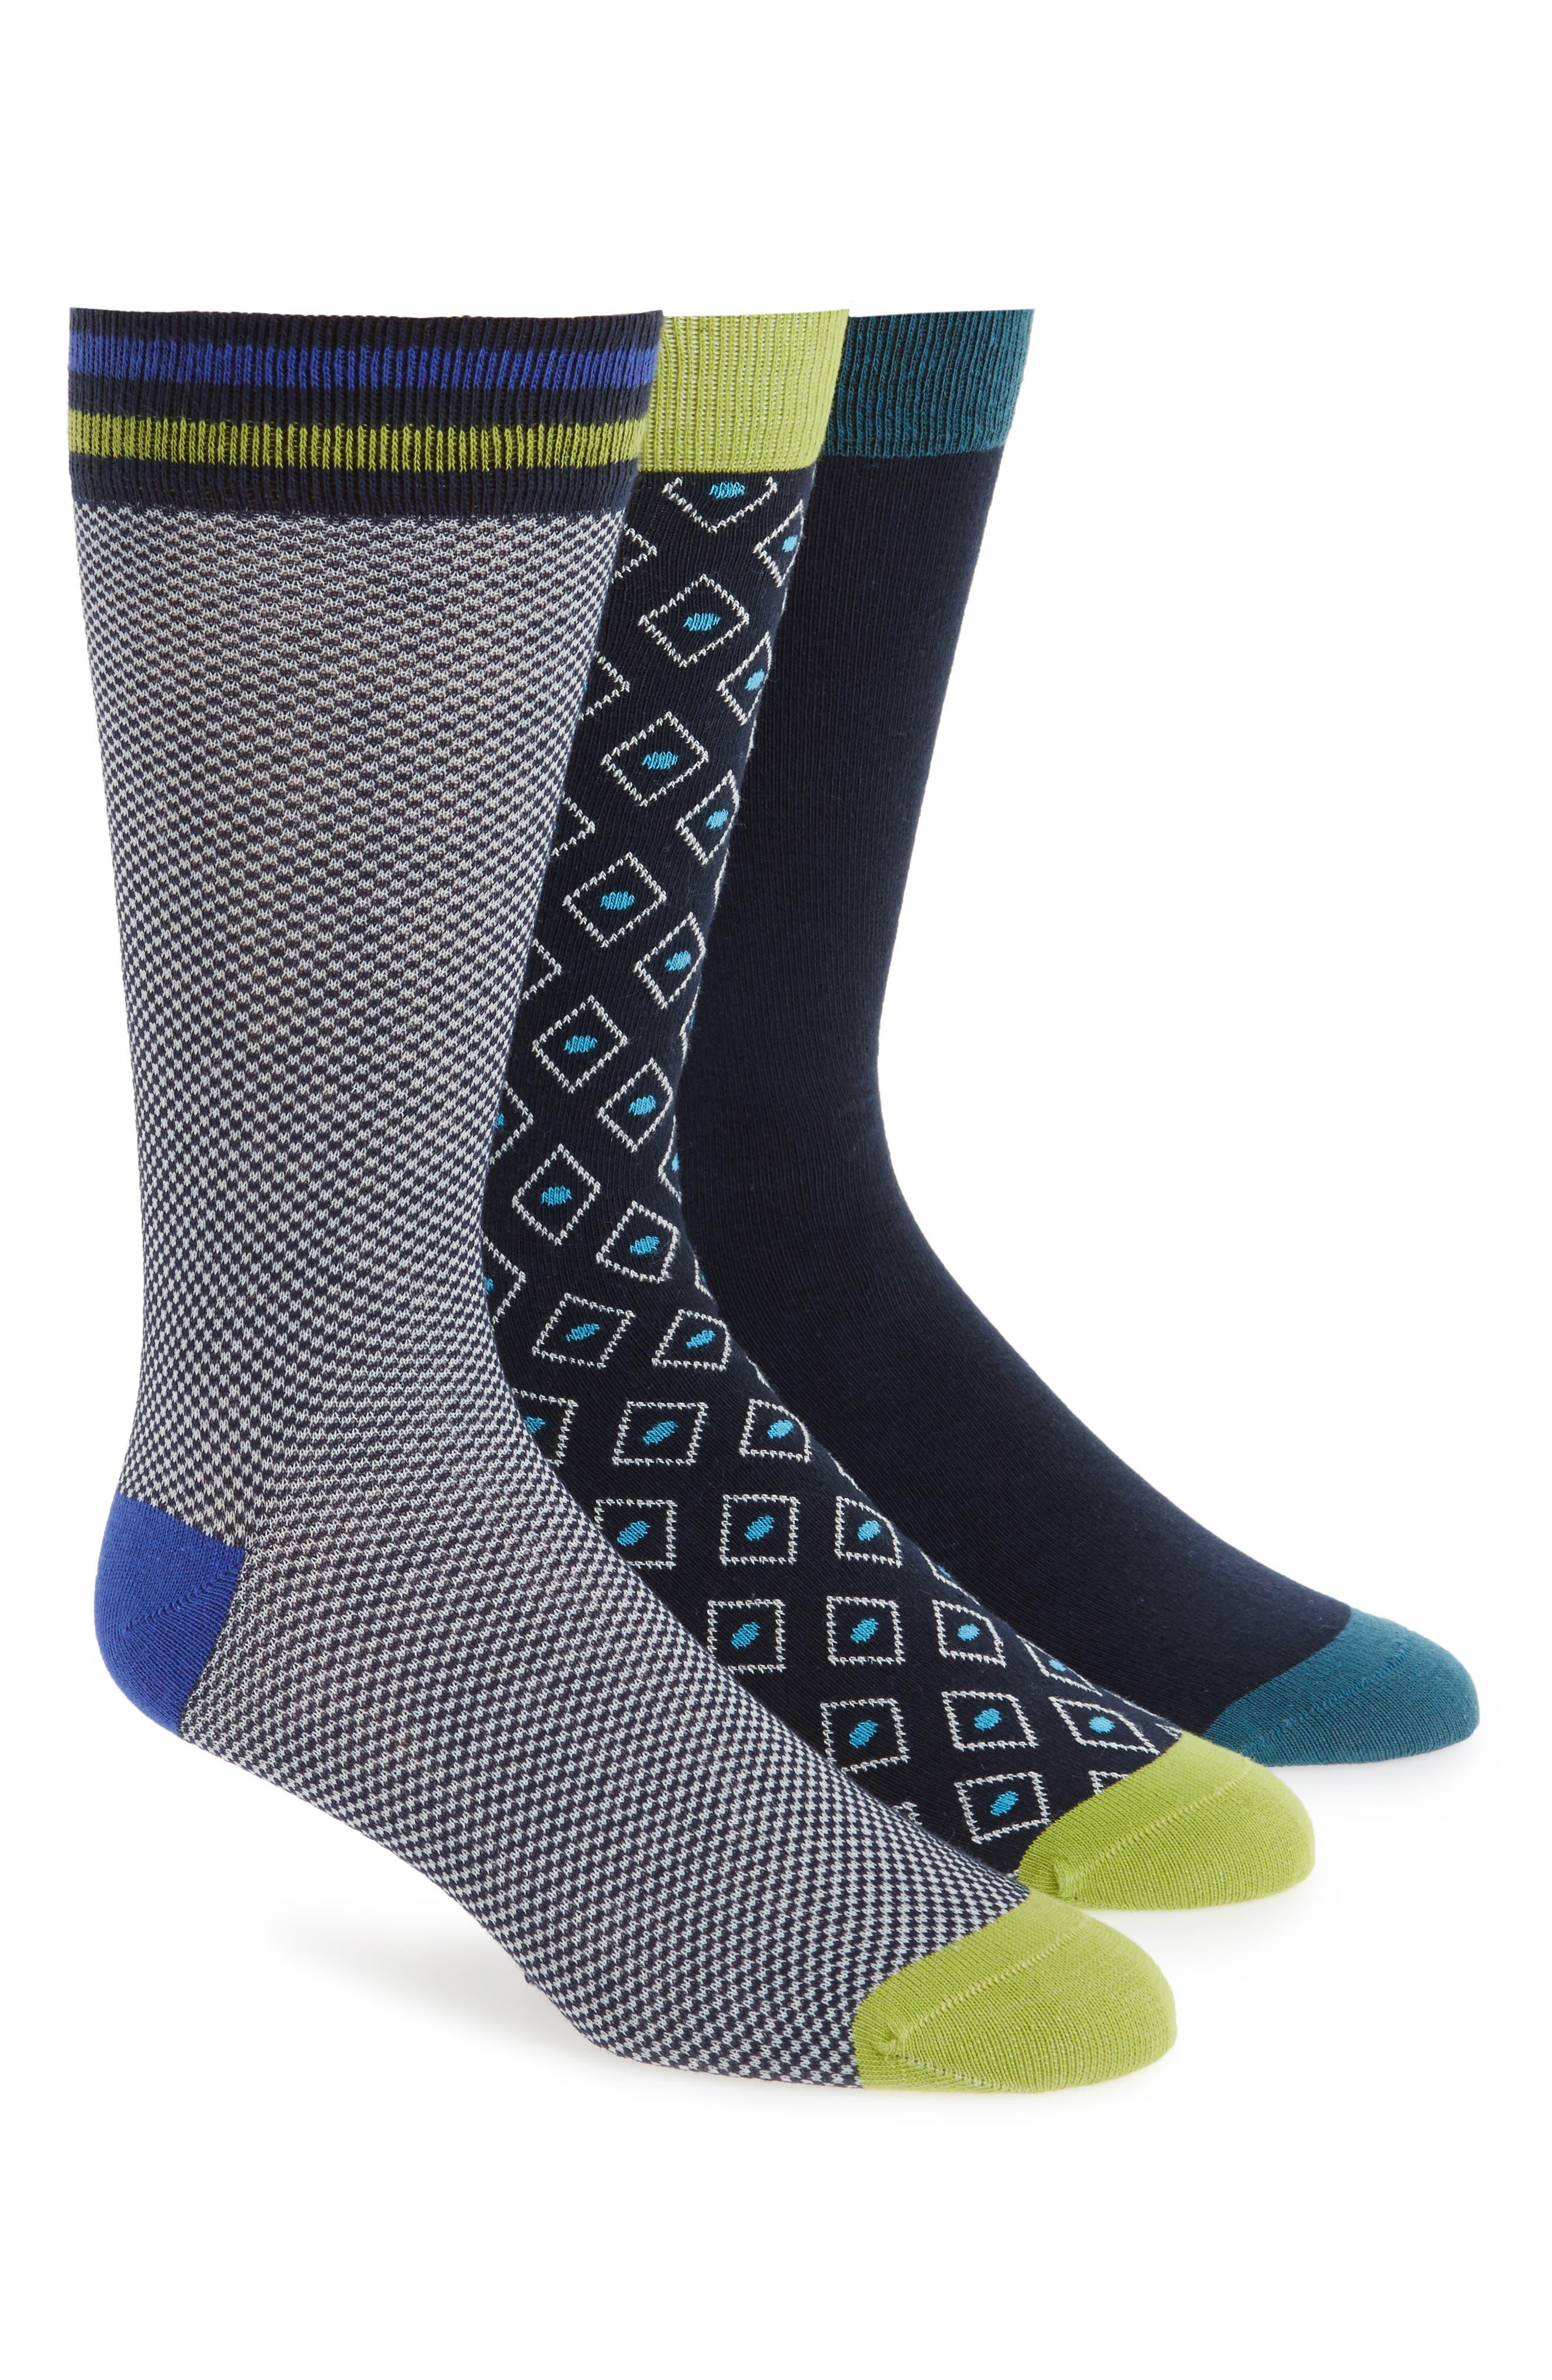 3-Pack Socks,                         Main,                         color, Blue Assorted